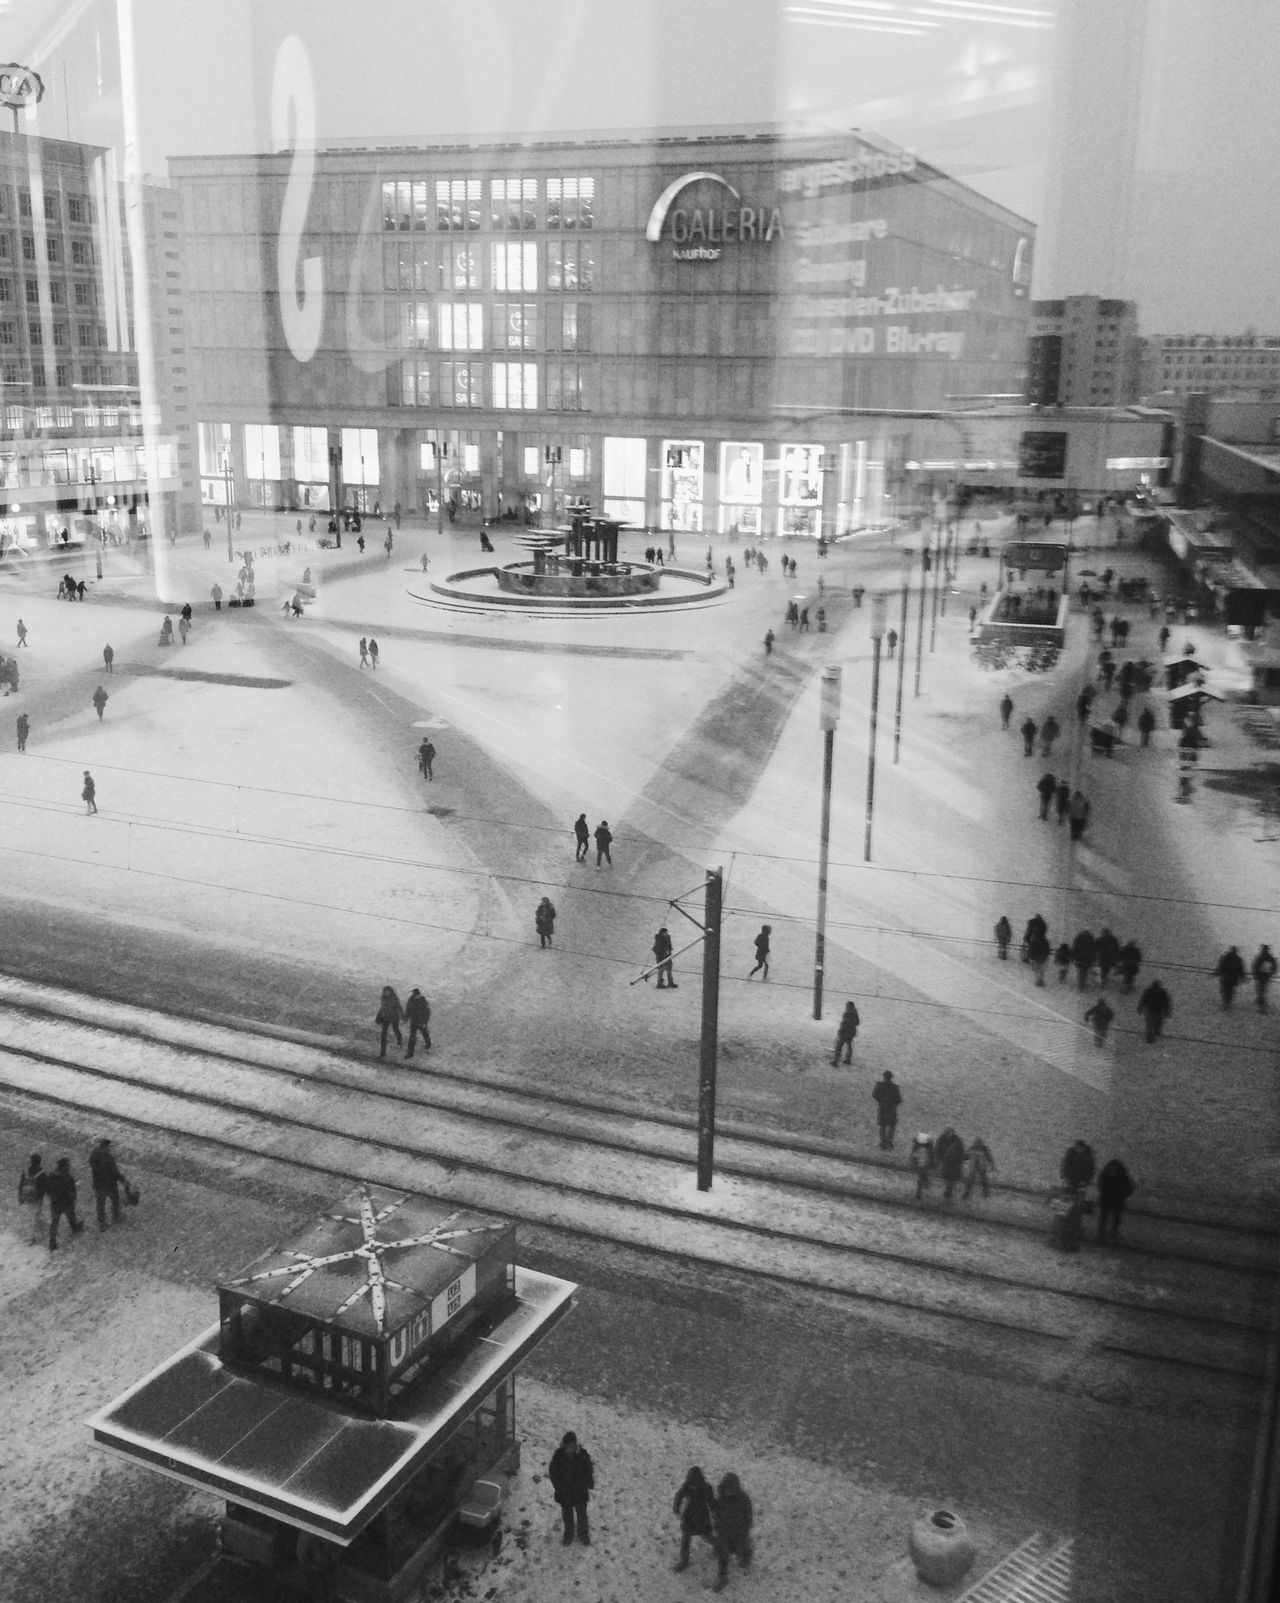 Berlin Berlin Photography Berliner Ansichten People Alexanderplatz City City Life Cityscape Blackandwhite Black And White Bnw Bnw_friday_eyeemchallenge